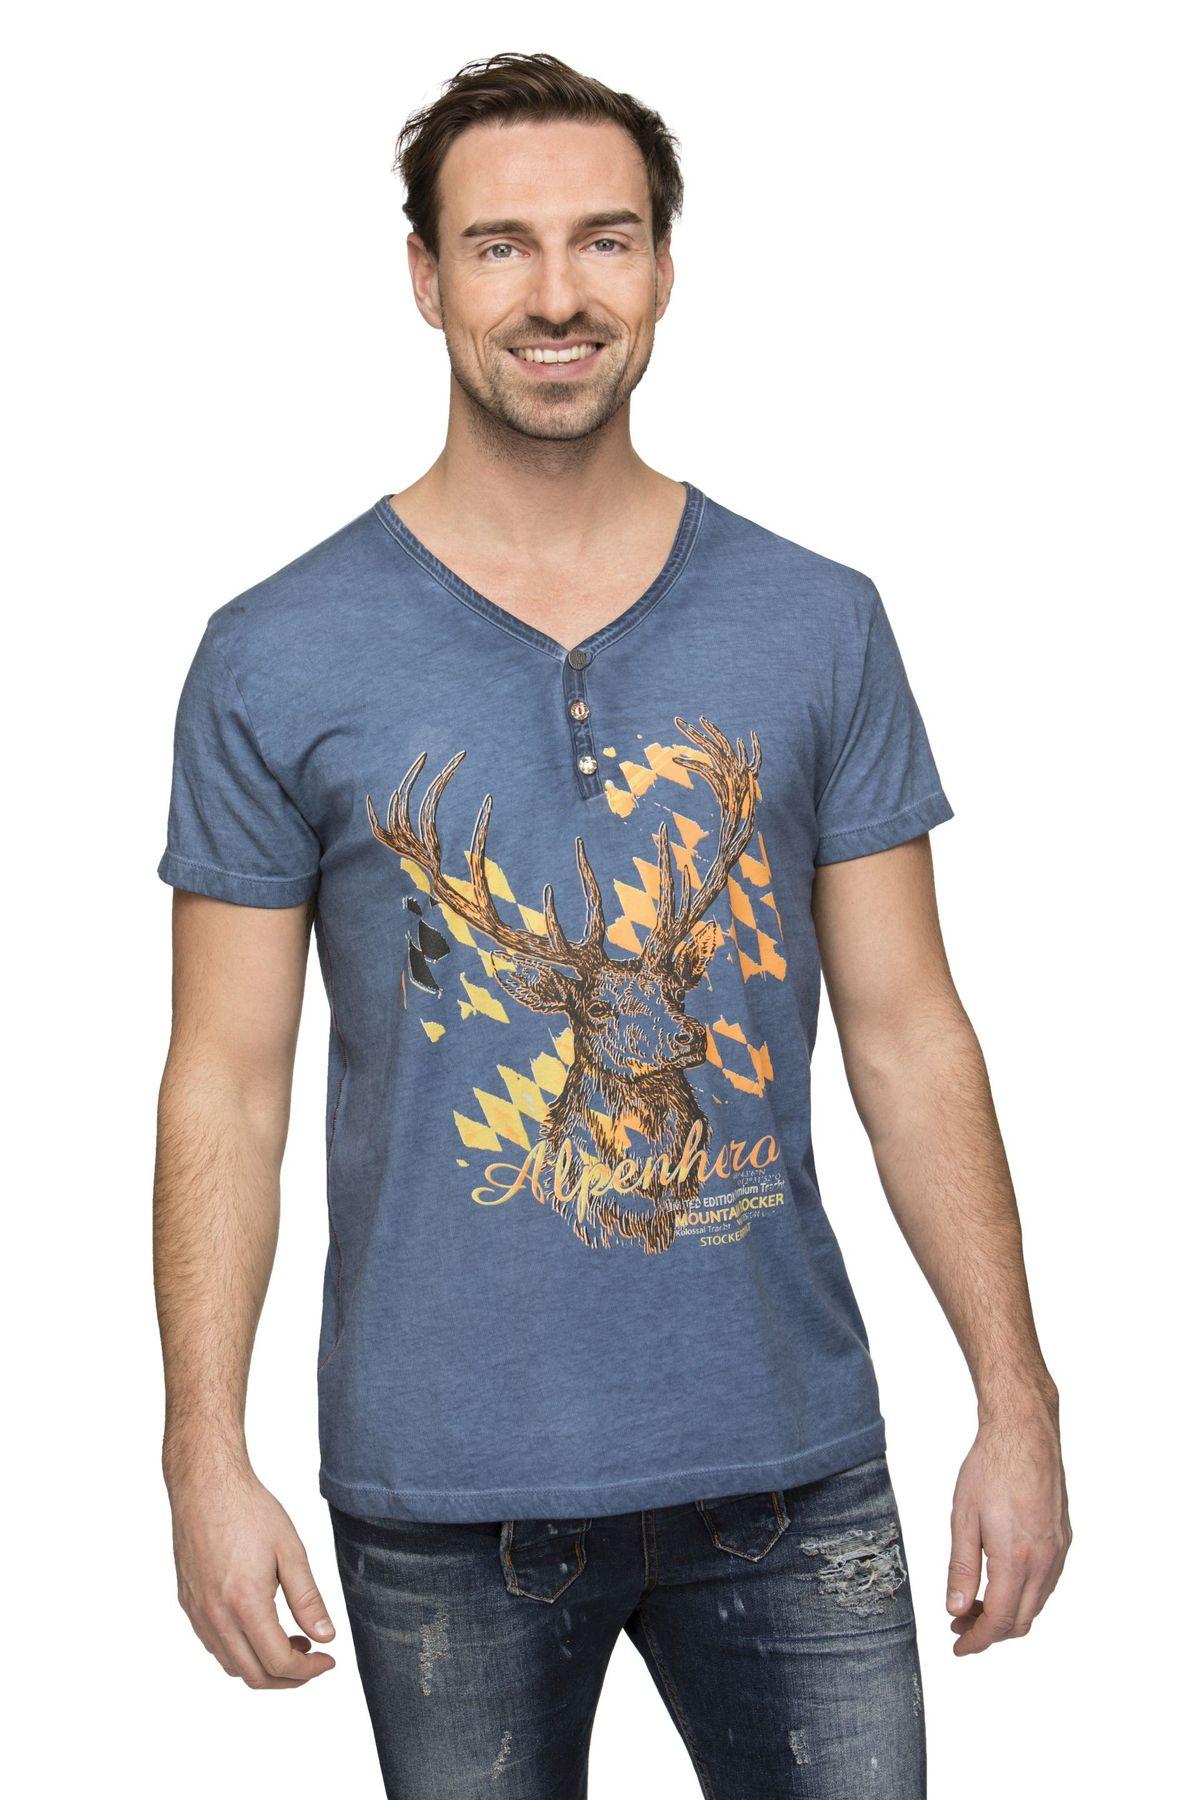 Stockerpoint - Herren Trachten T-Shirt, Feli – Bild 8